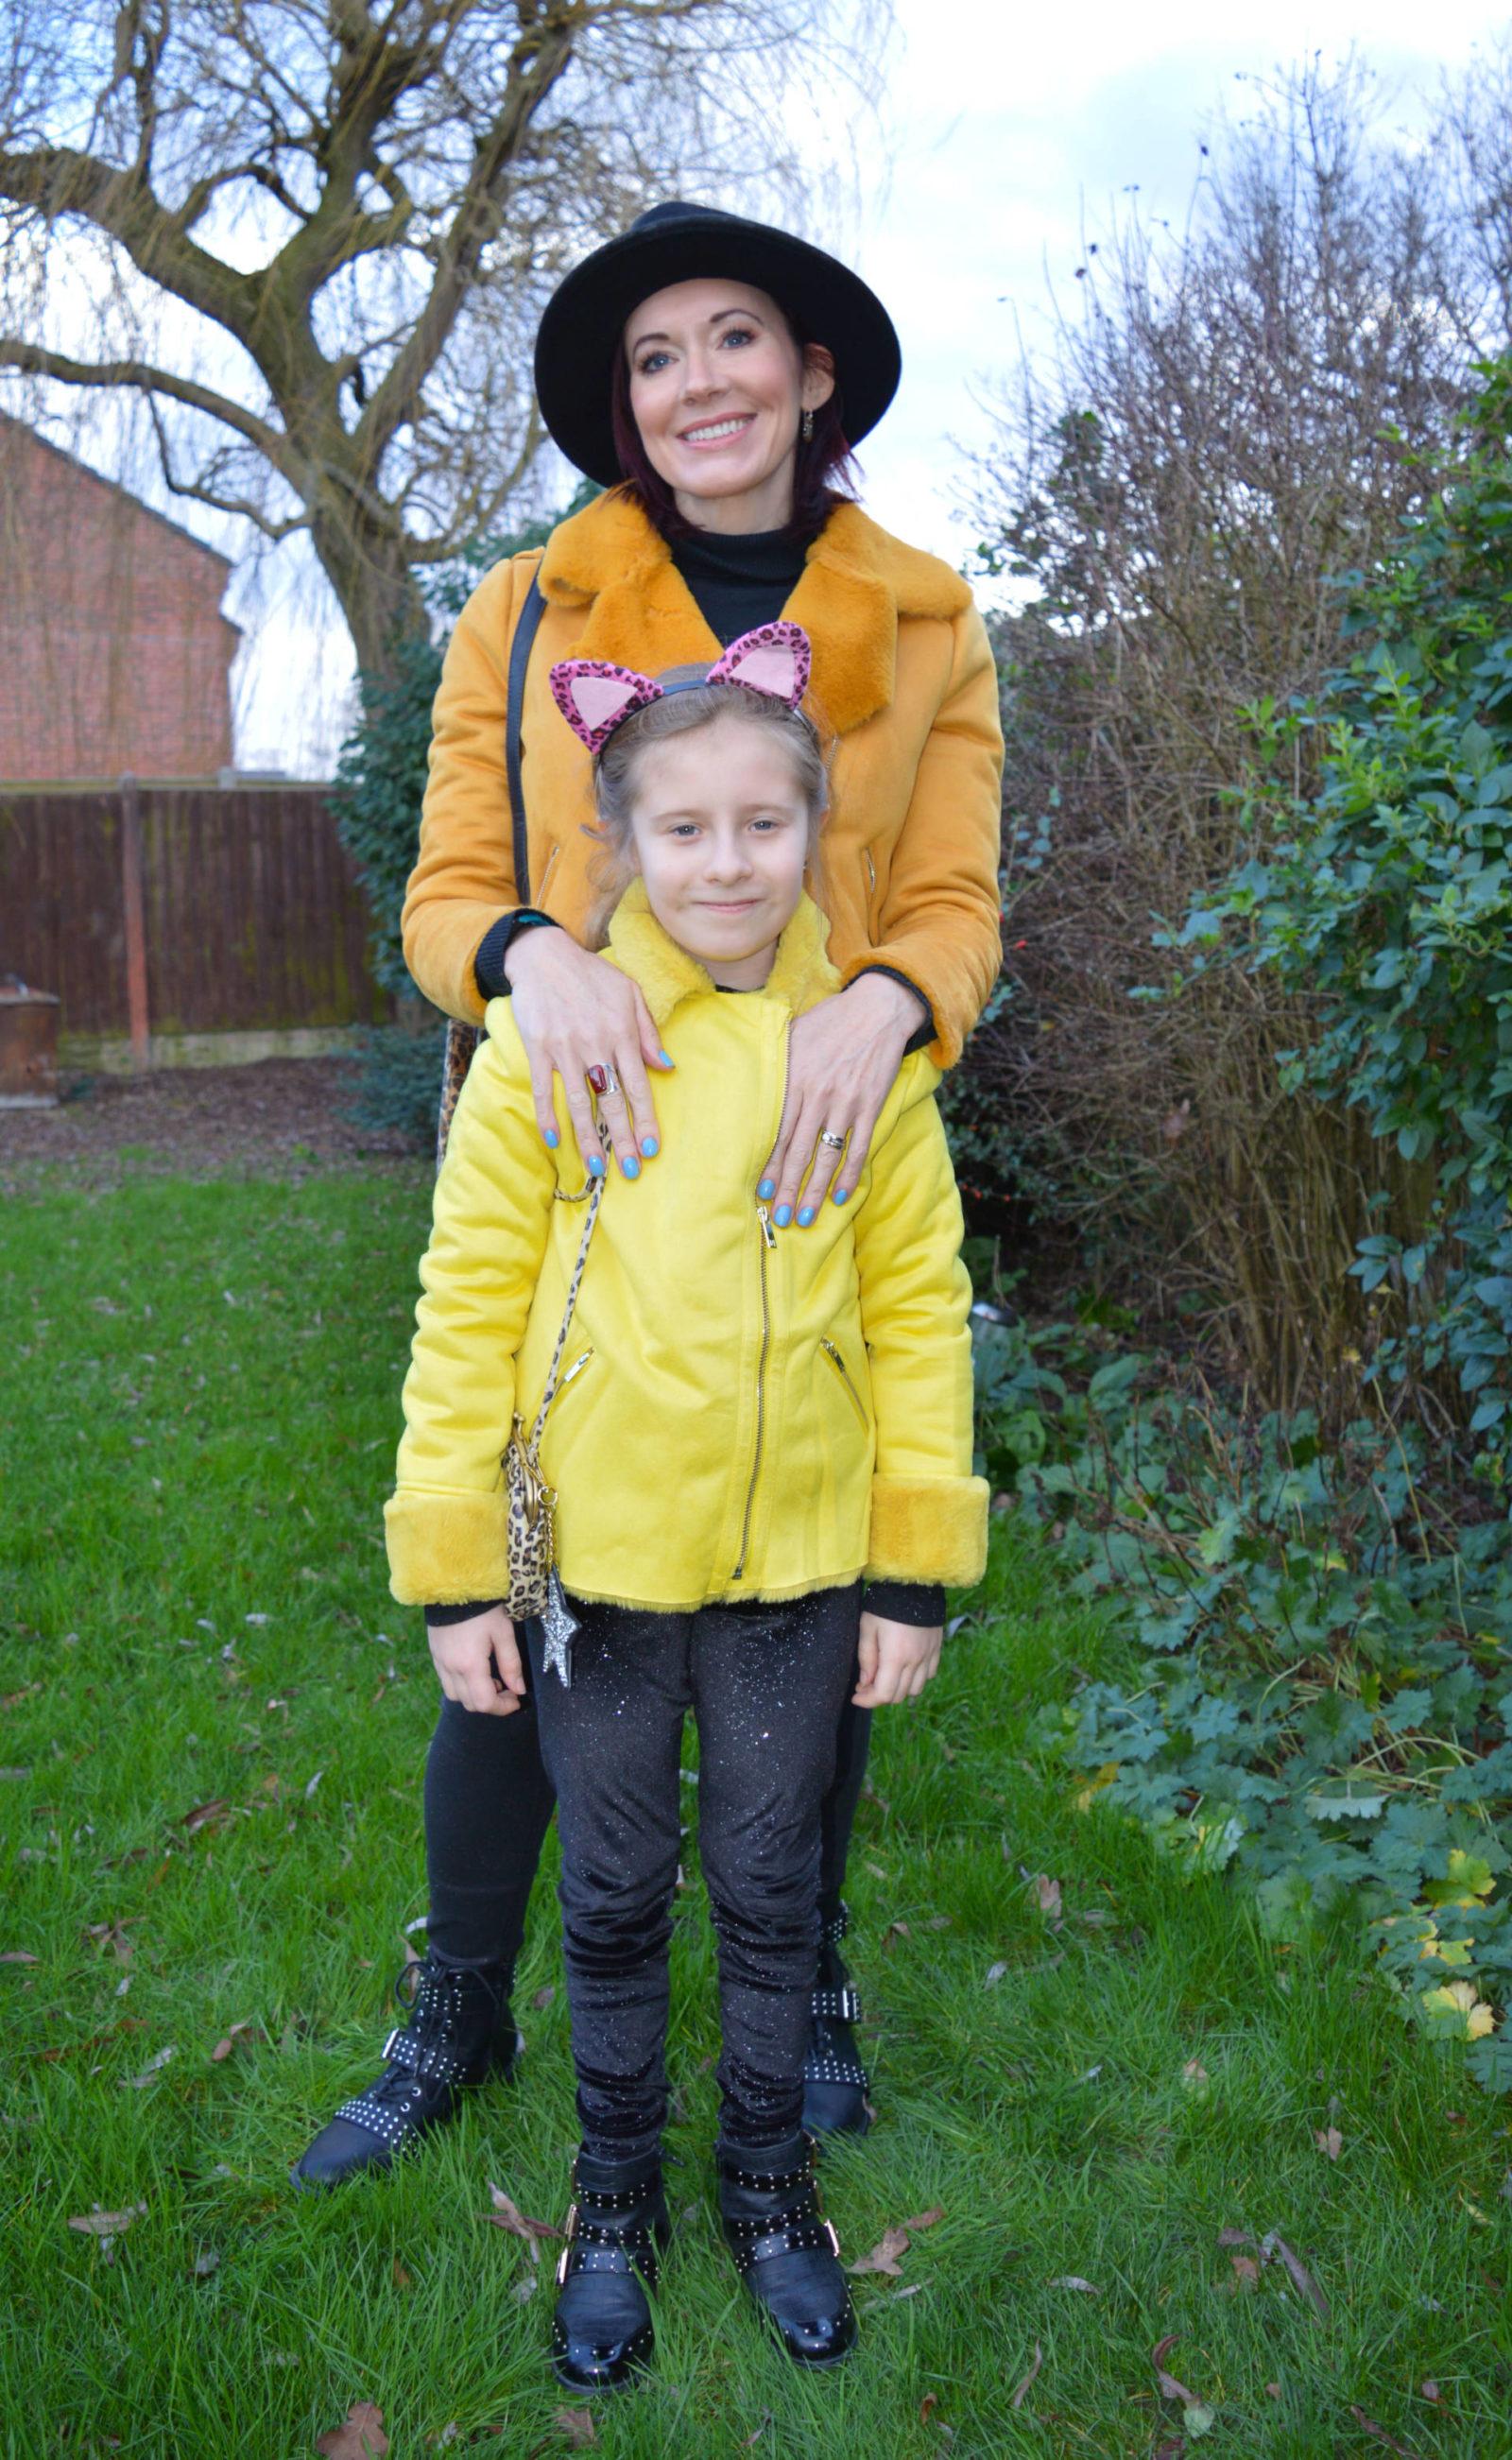 Matching yellow jackets, glitter trousers and biker boots